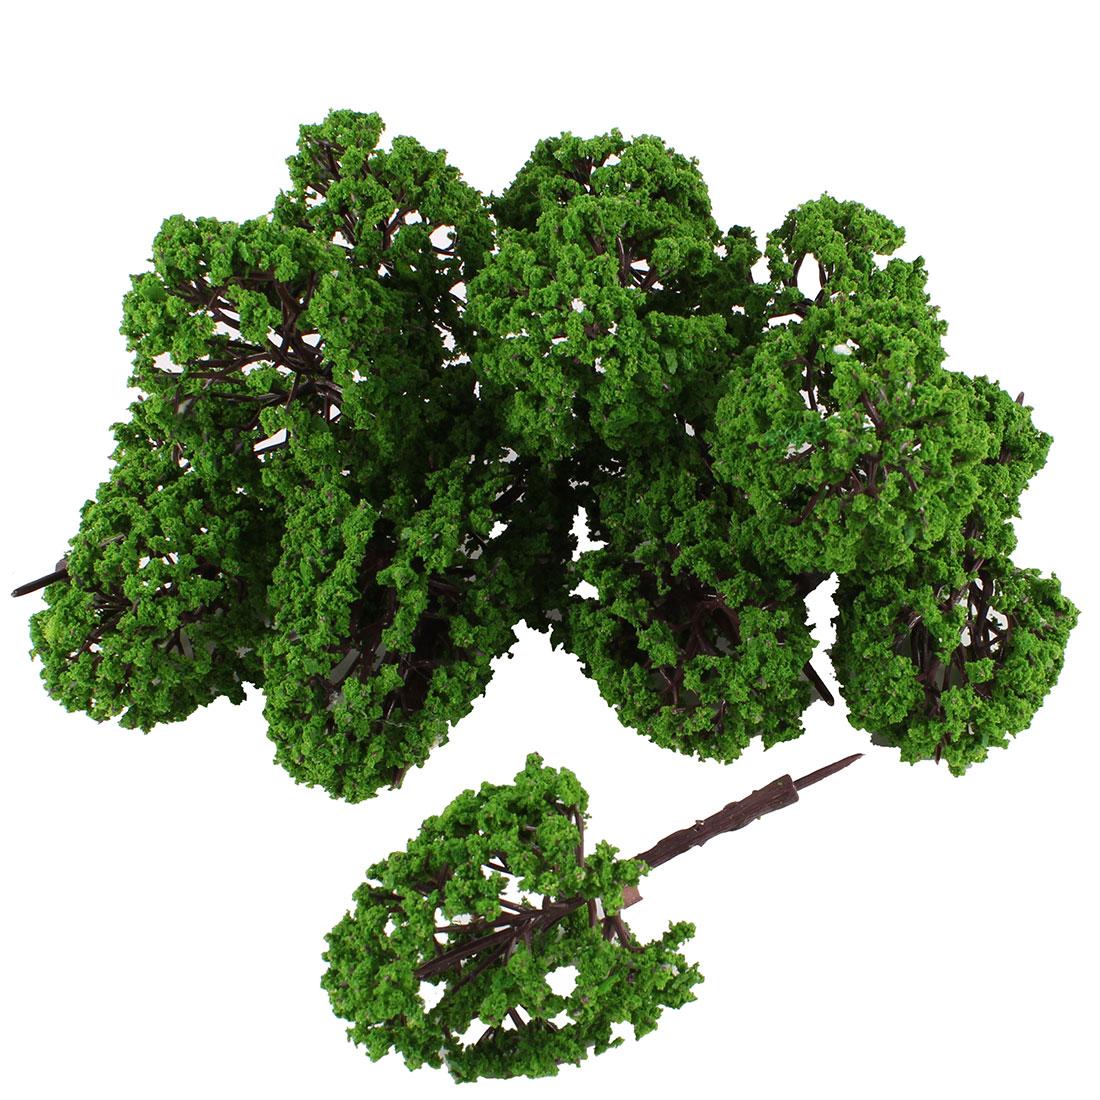 "10Pcs Artificial Plastic Green Leaf Model Tree 11cm 4.3"" High 1:75"